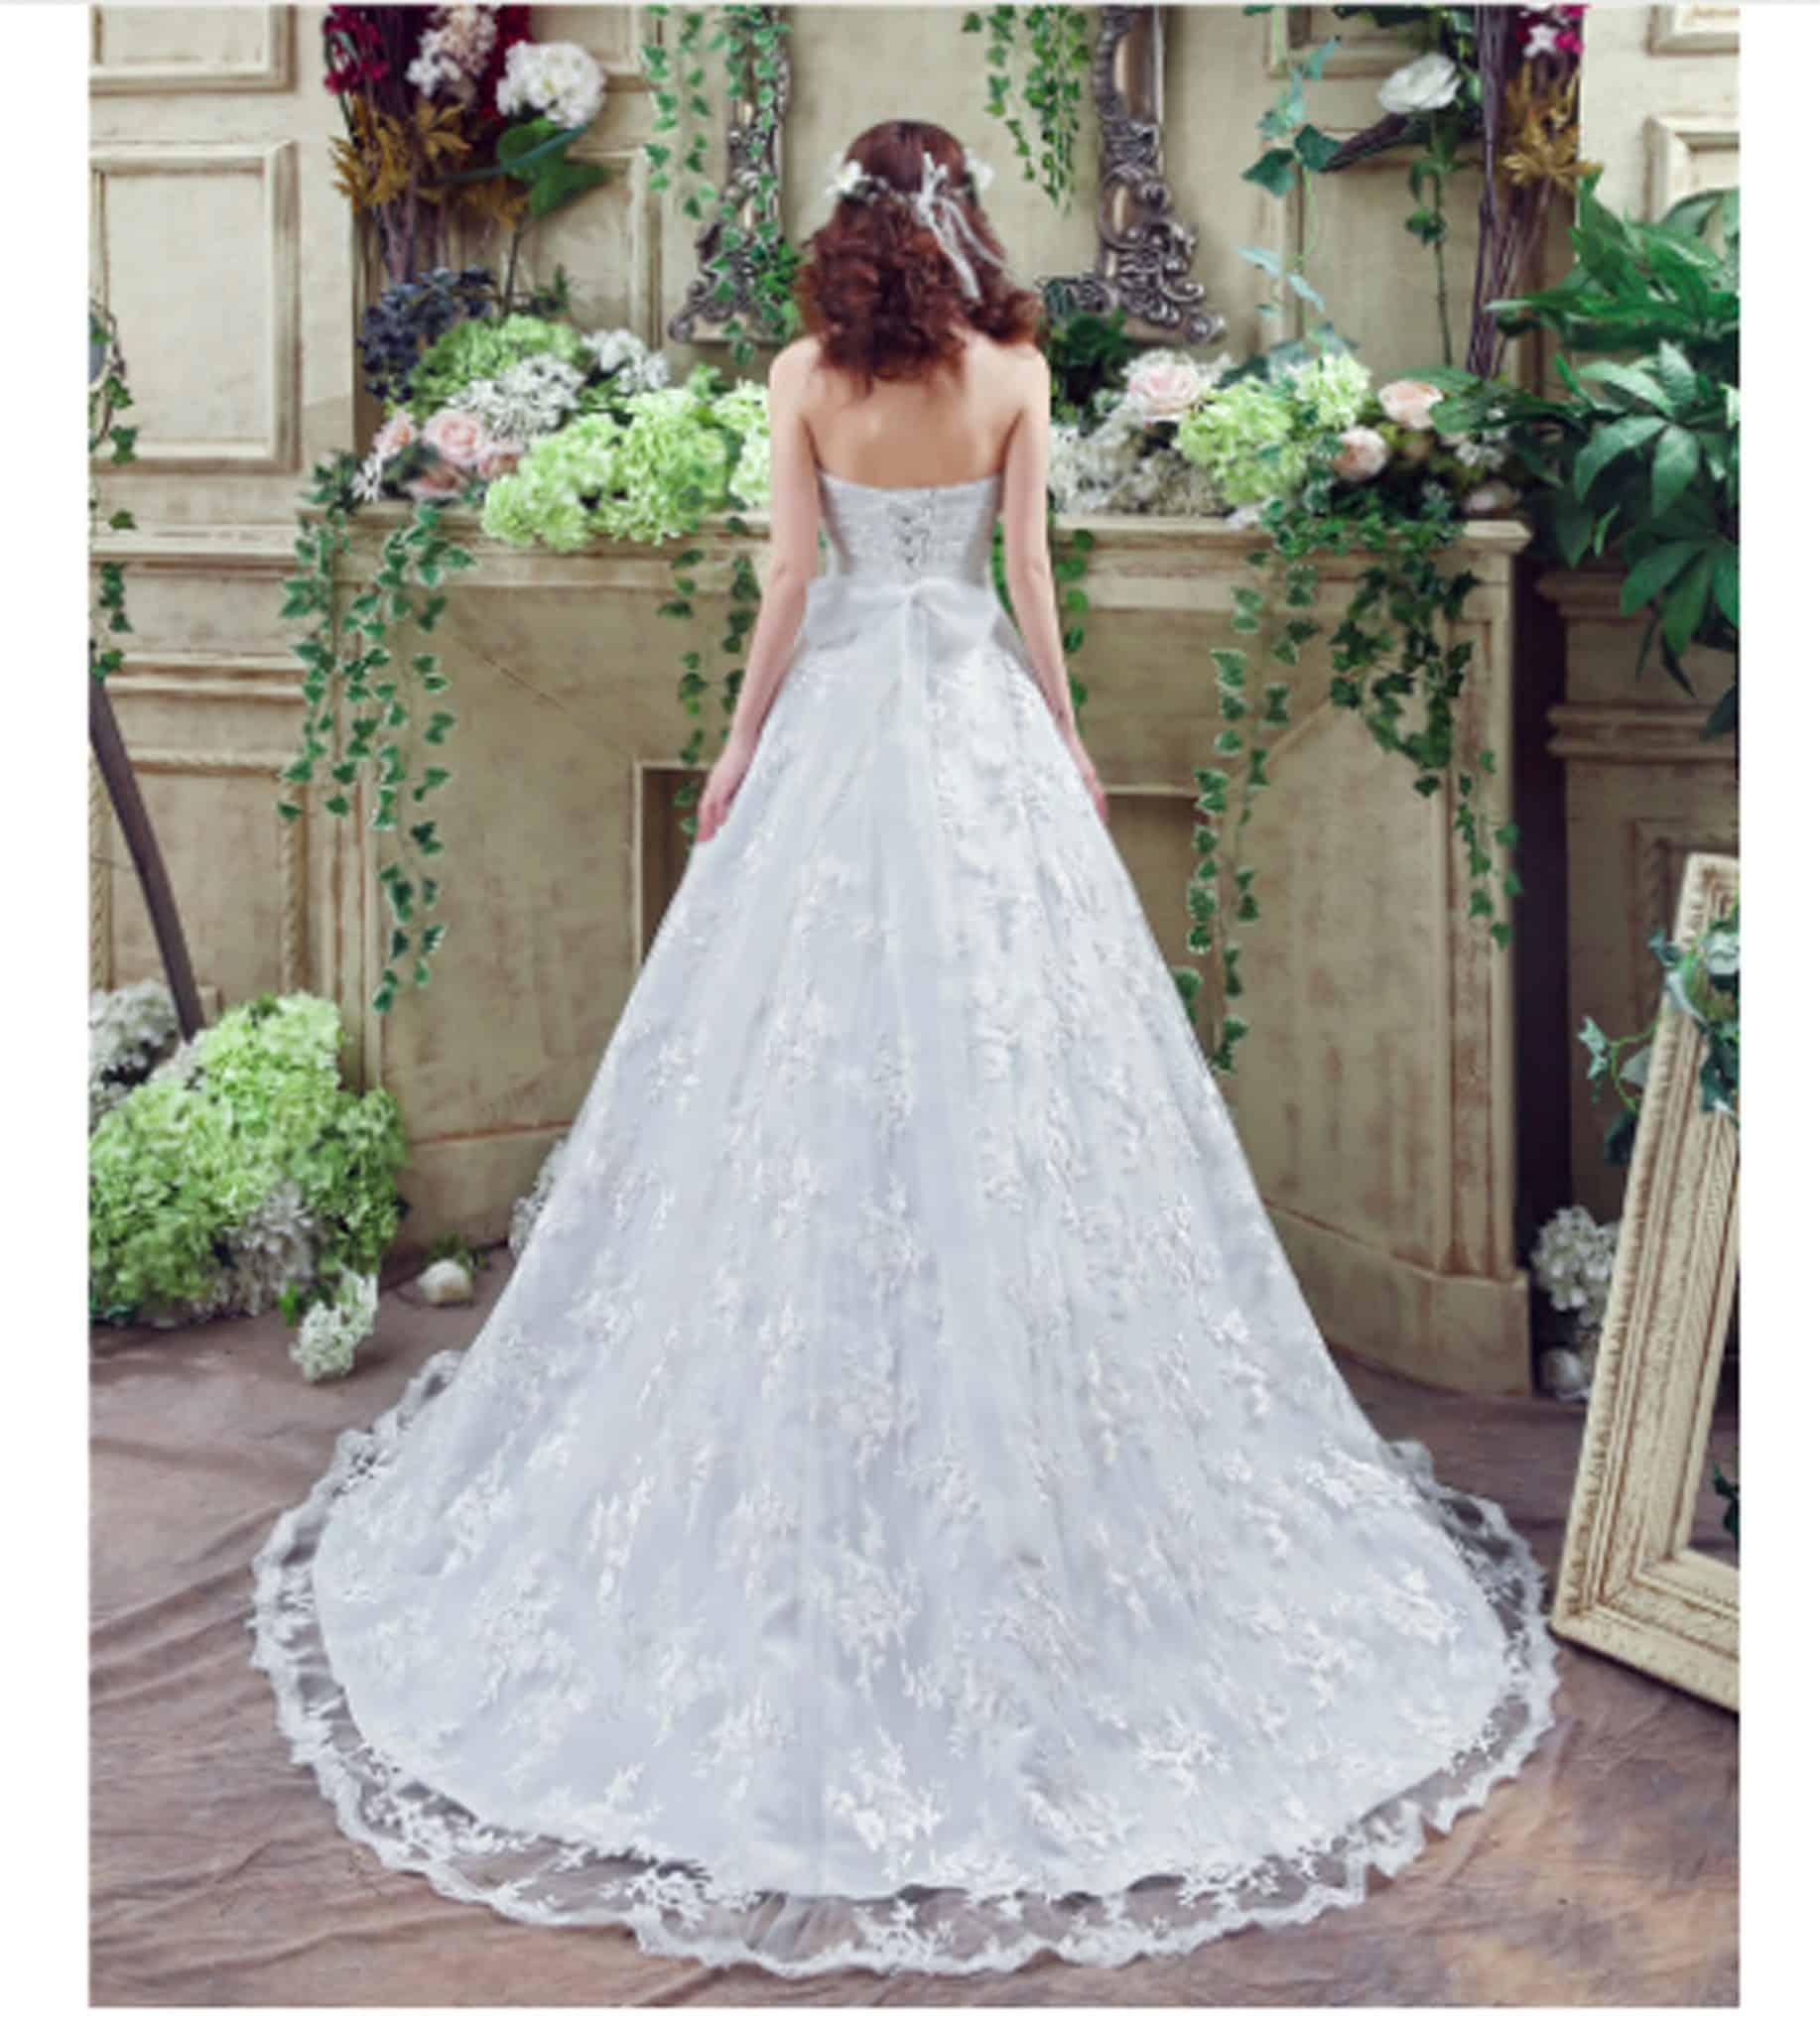 Sweetheart Lace Wedding Dress: Elegant Sweetheart Lace Princess Cut Wedding Dress